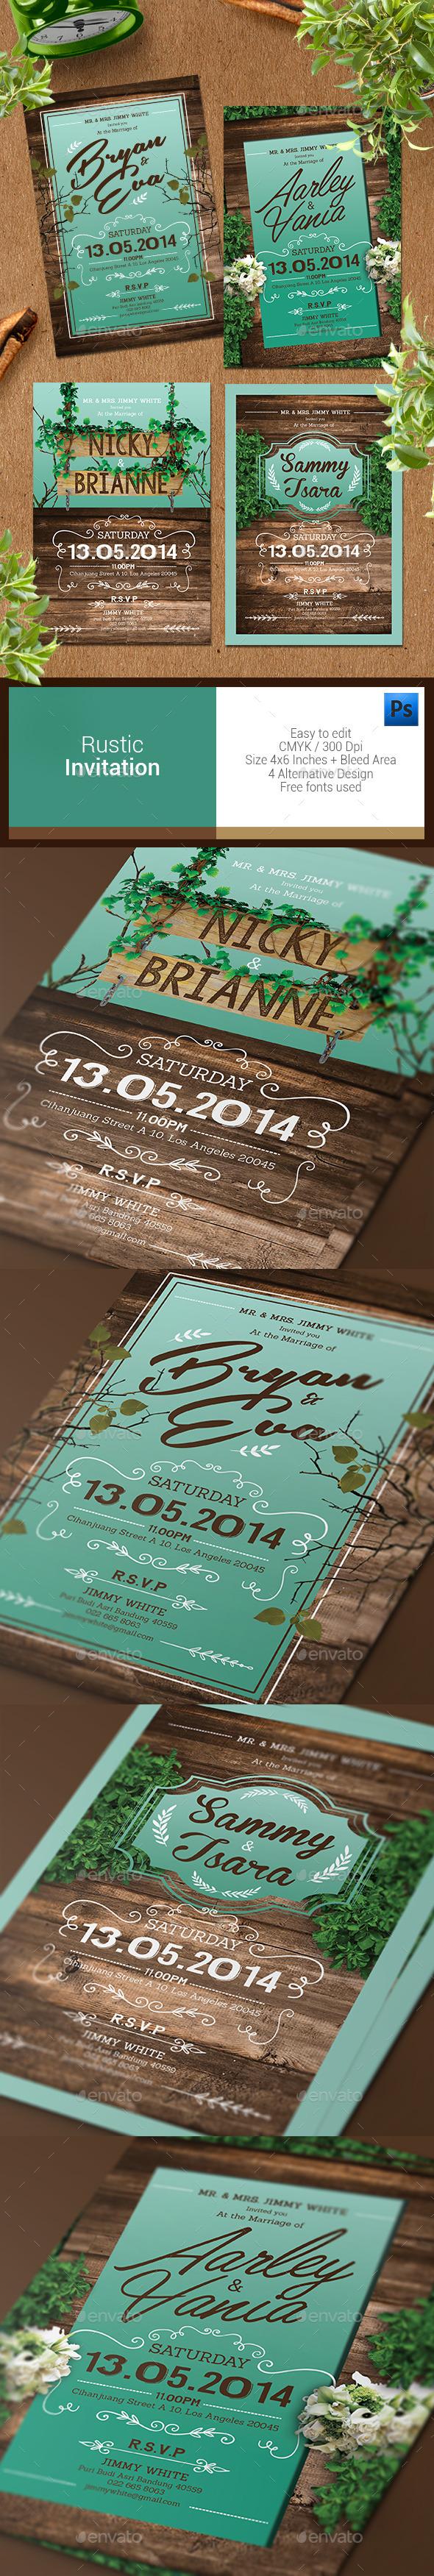 Rustic Invitation - Weddings Cards & Invites